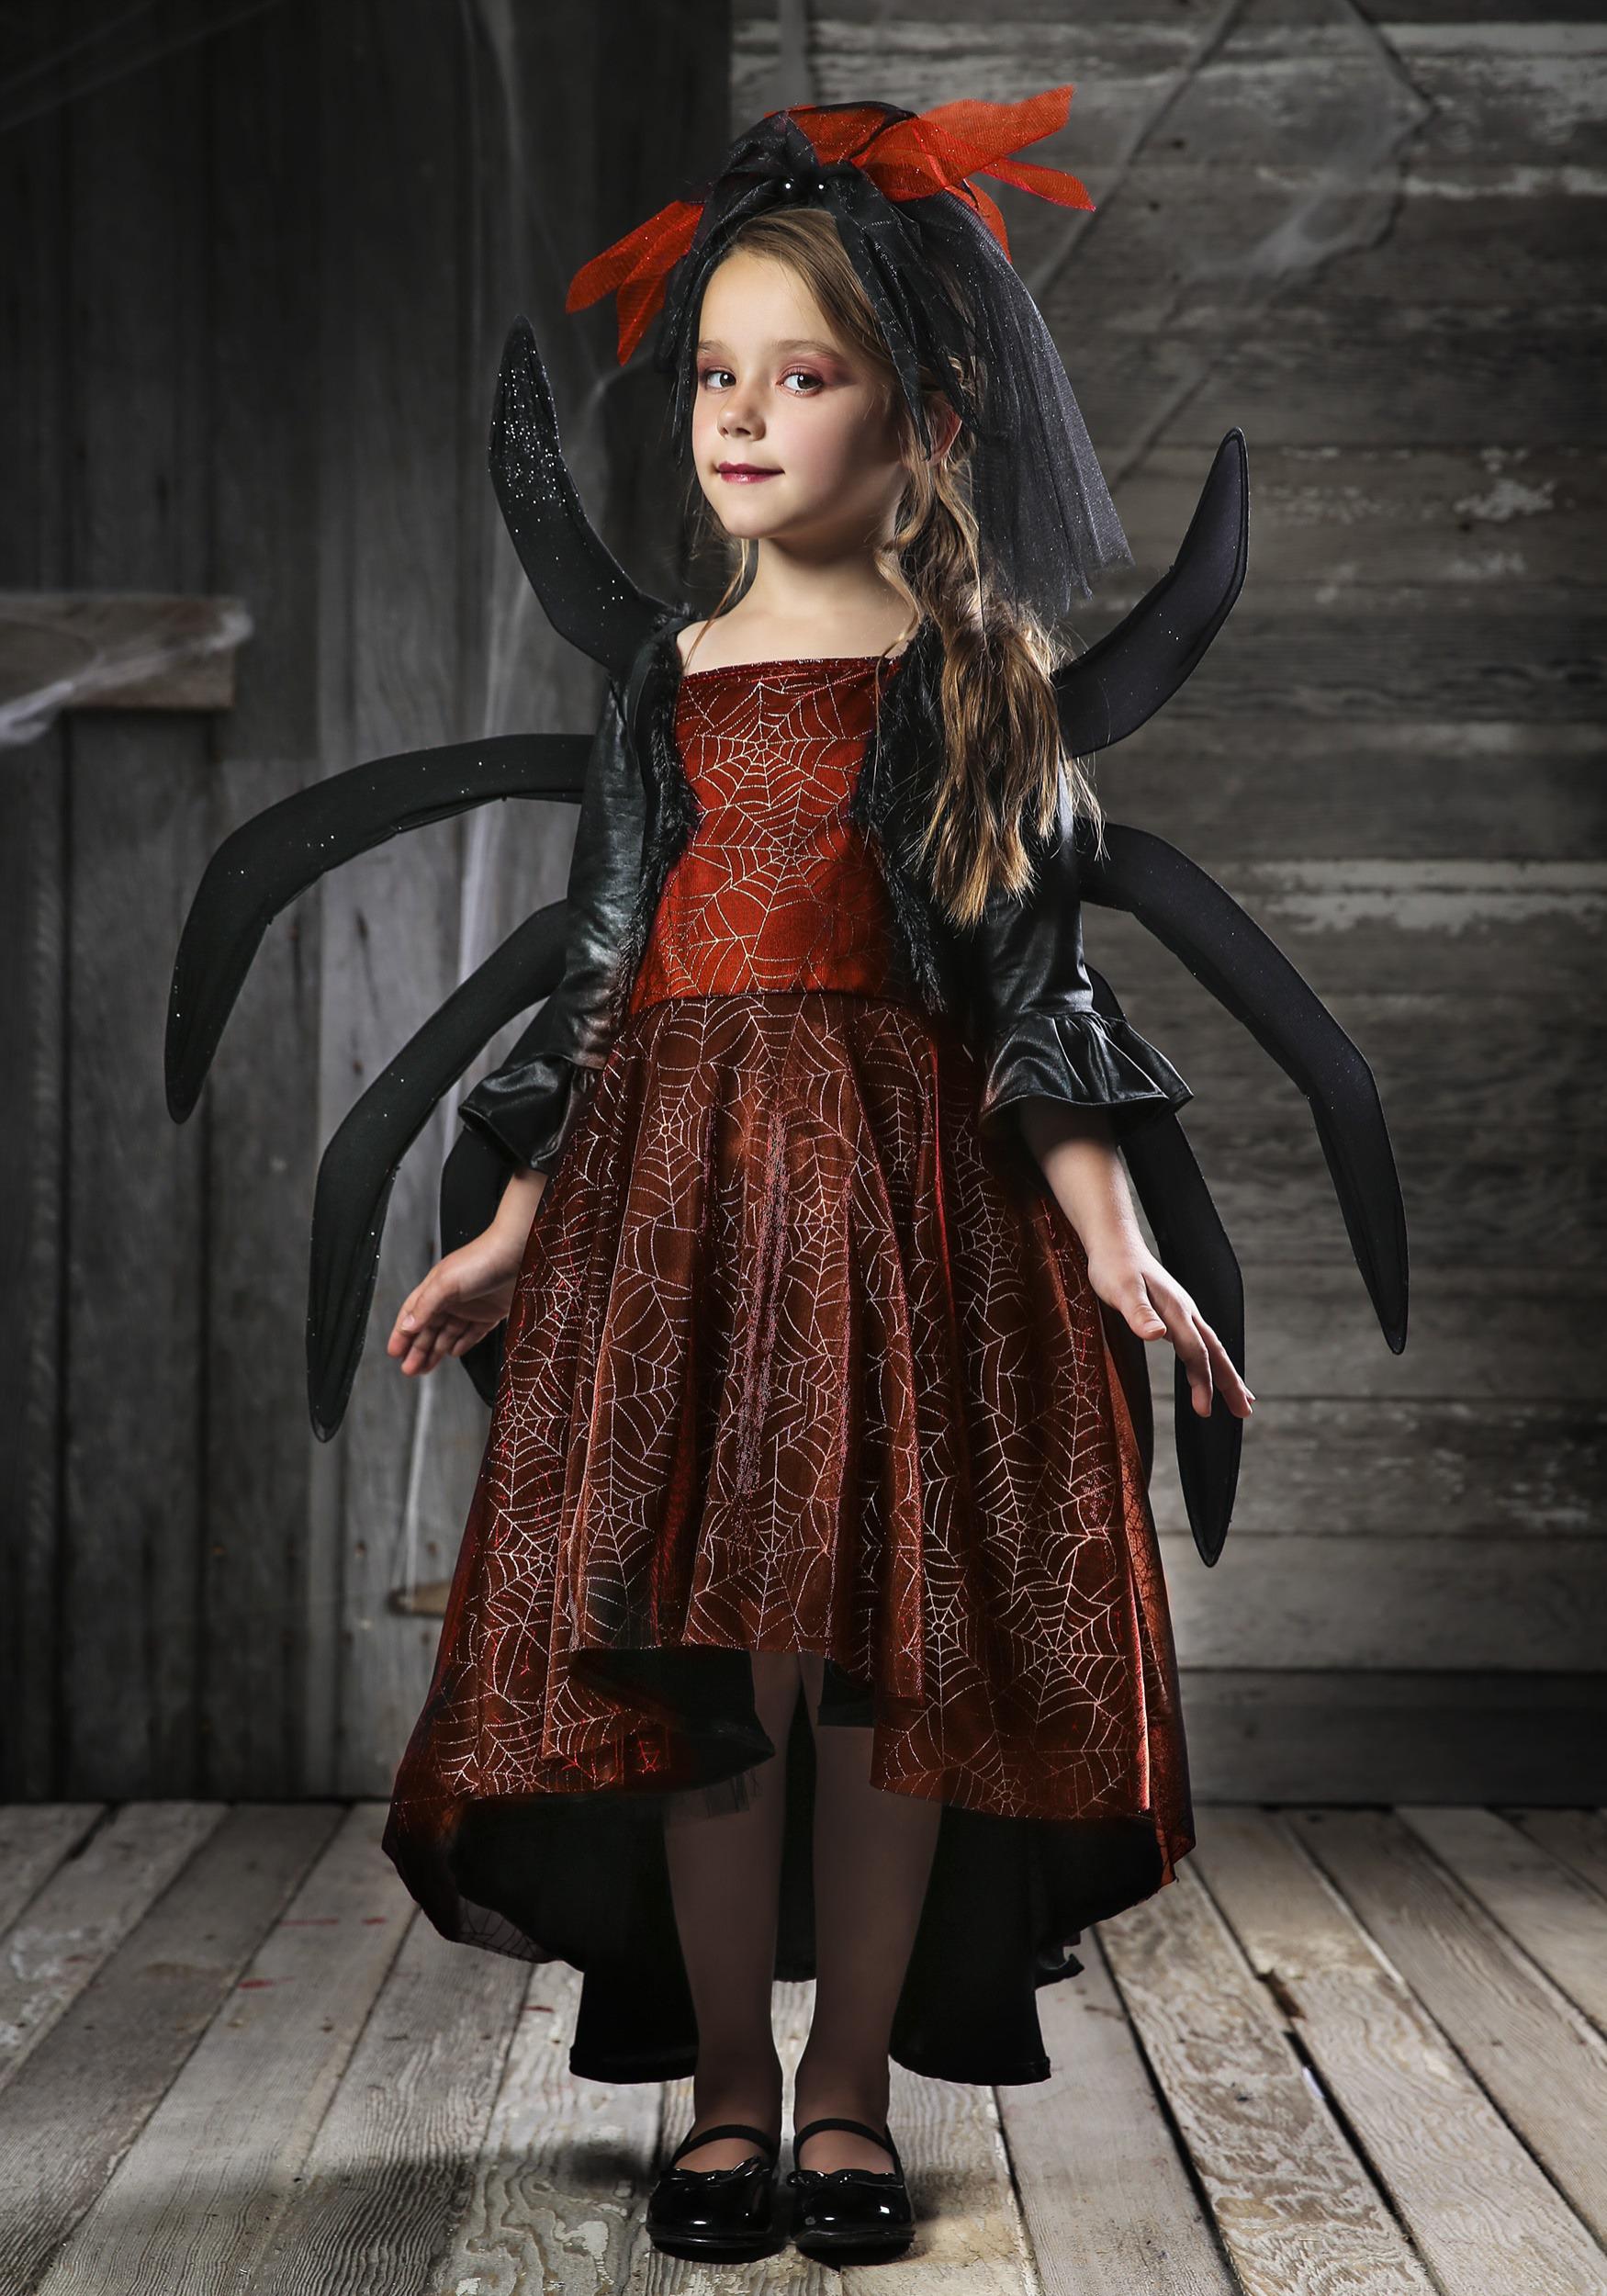 Girlu0027s Spooky Widow Dress Costume  sc 1 st  Halloween Costumes & Scary Kids Costumes - Scary Halloween Costume for Kids